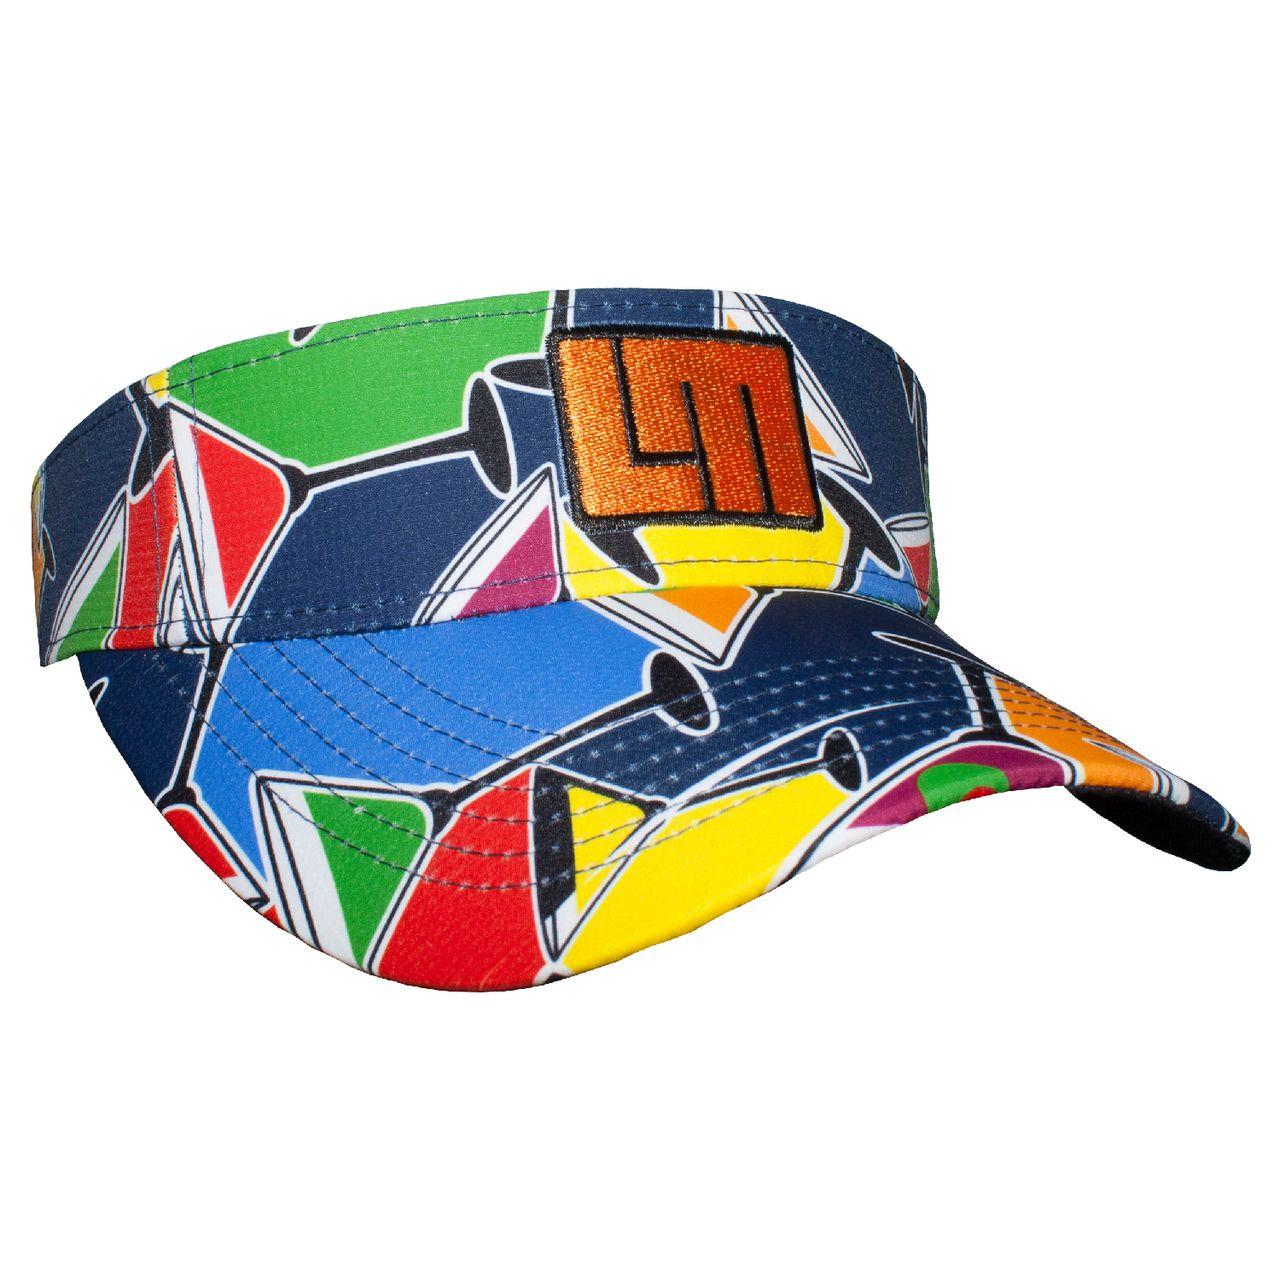 LOUDMOUTH 英國高爾夫服飾品牌-彩色雞尾酒中空帽